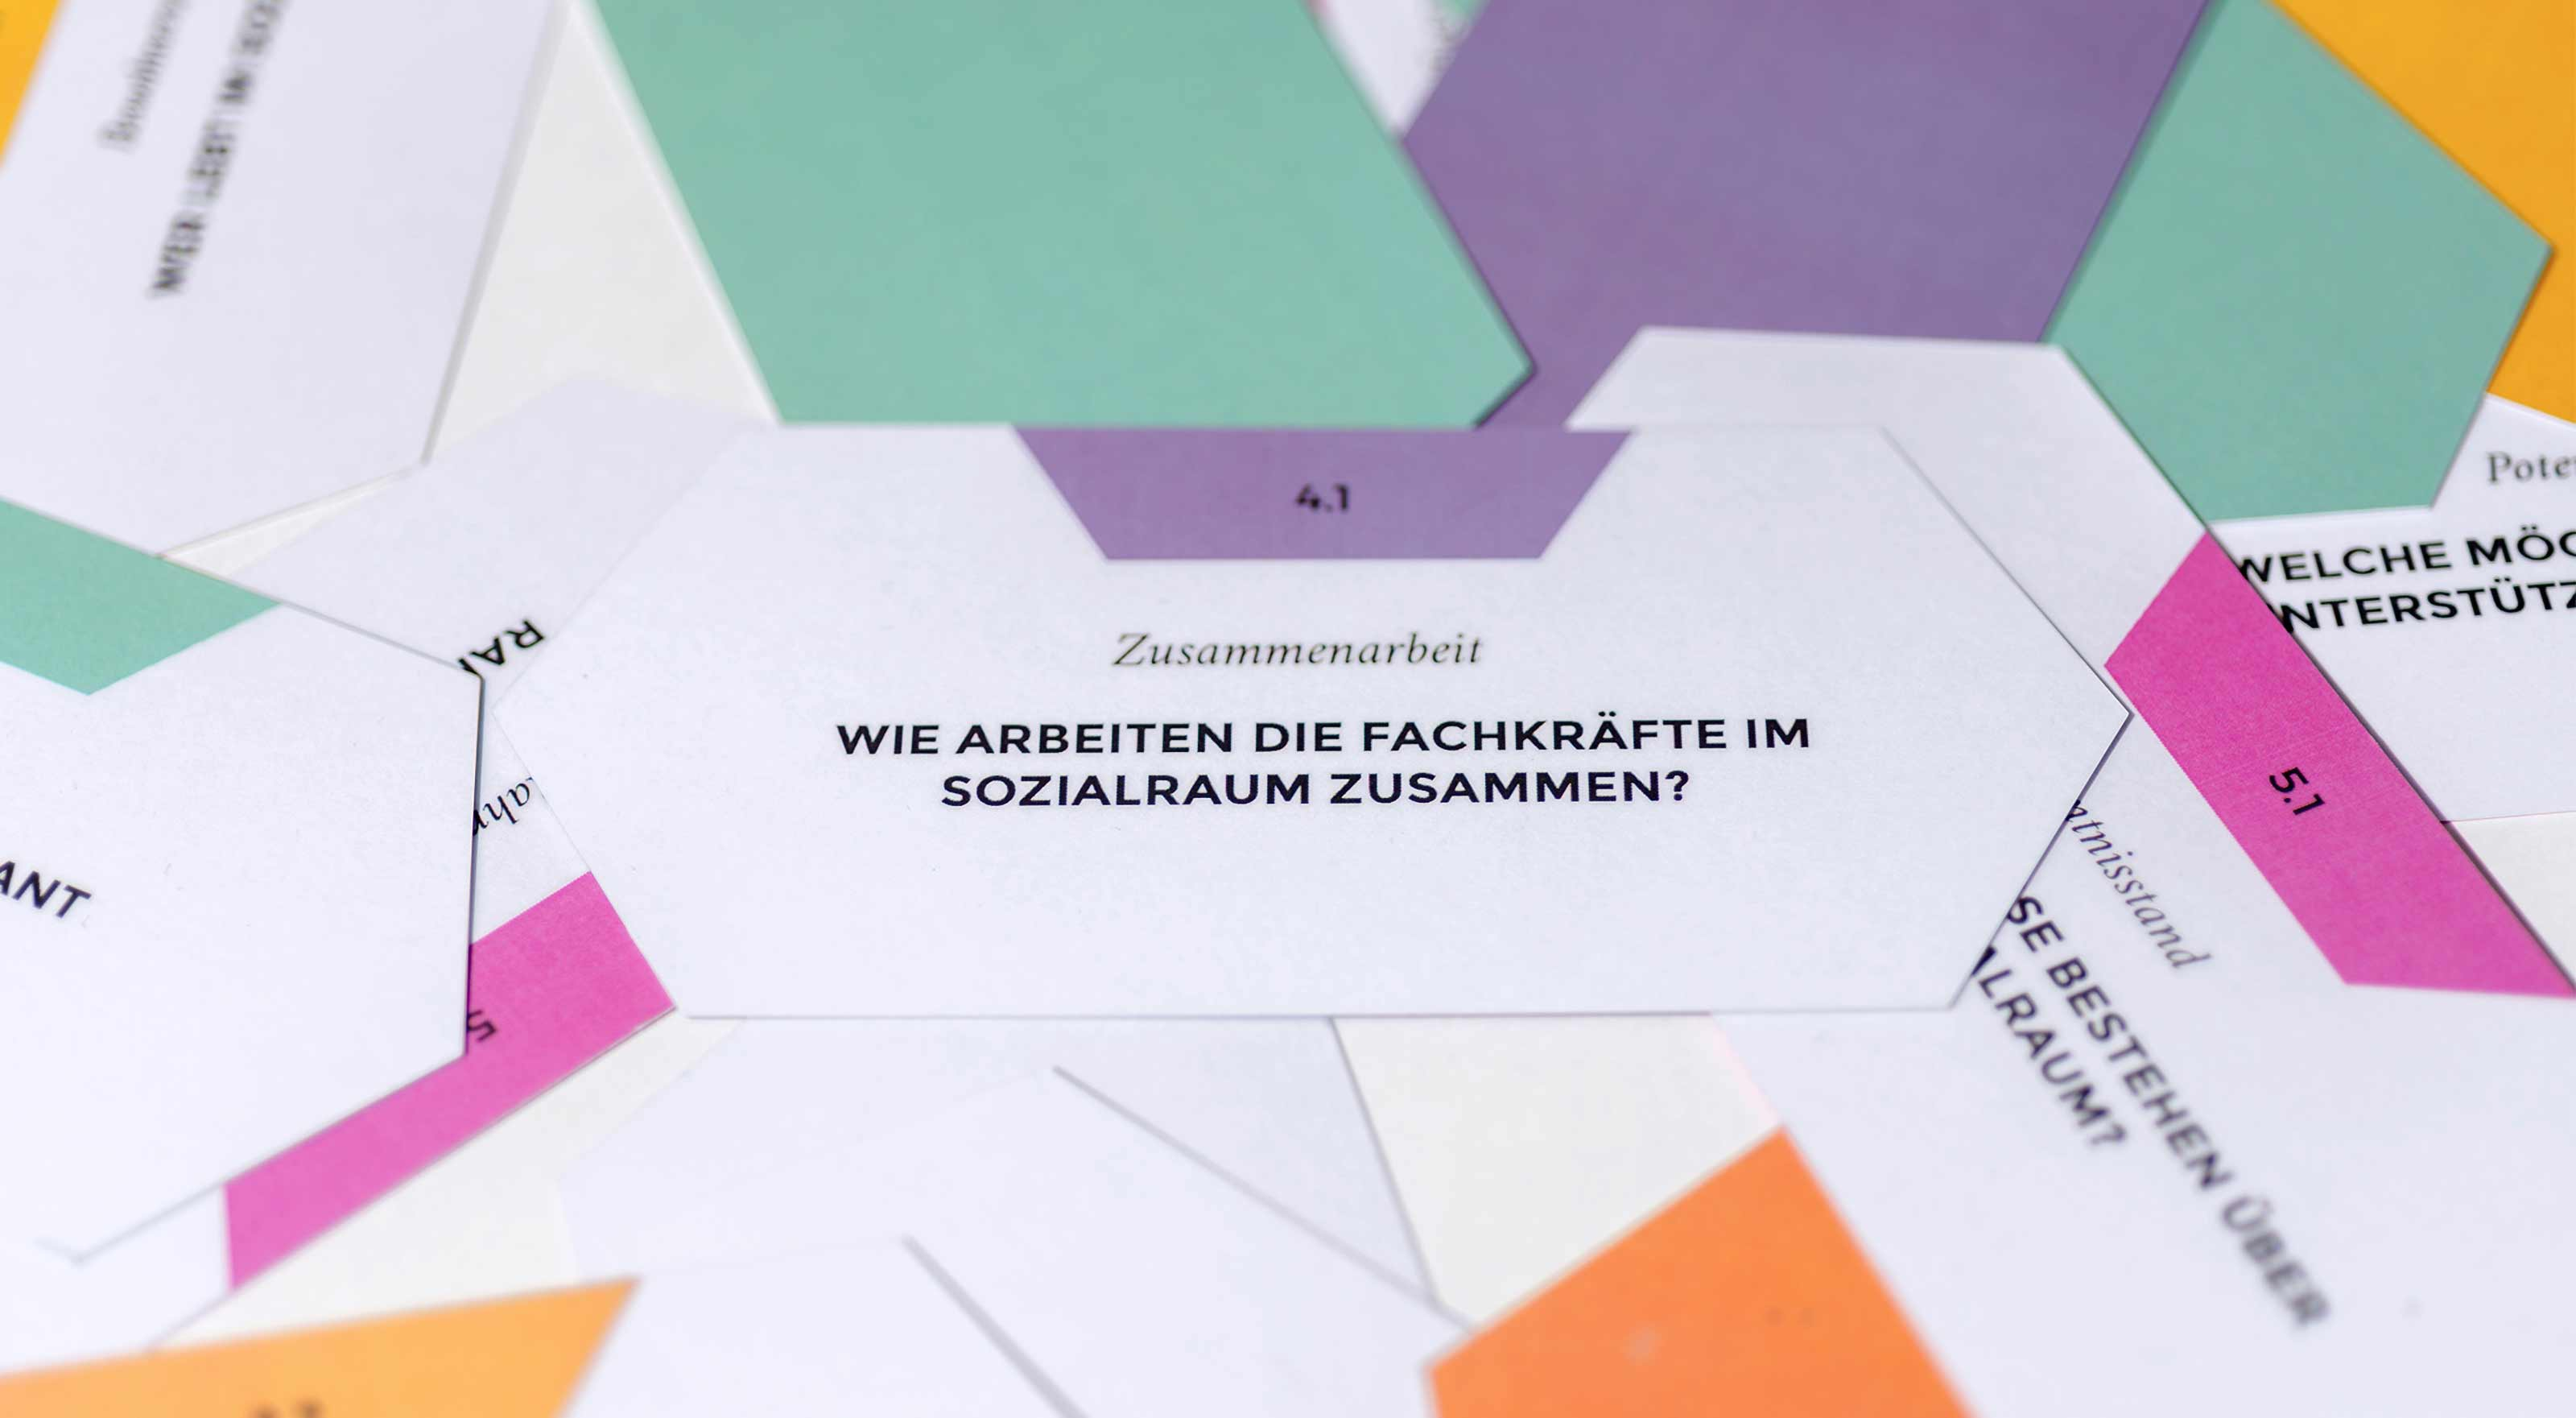 Corporate Design, Hochschule Esslingen, Tool Entwicklung, Print Design, Begleitheft